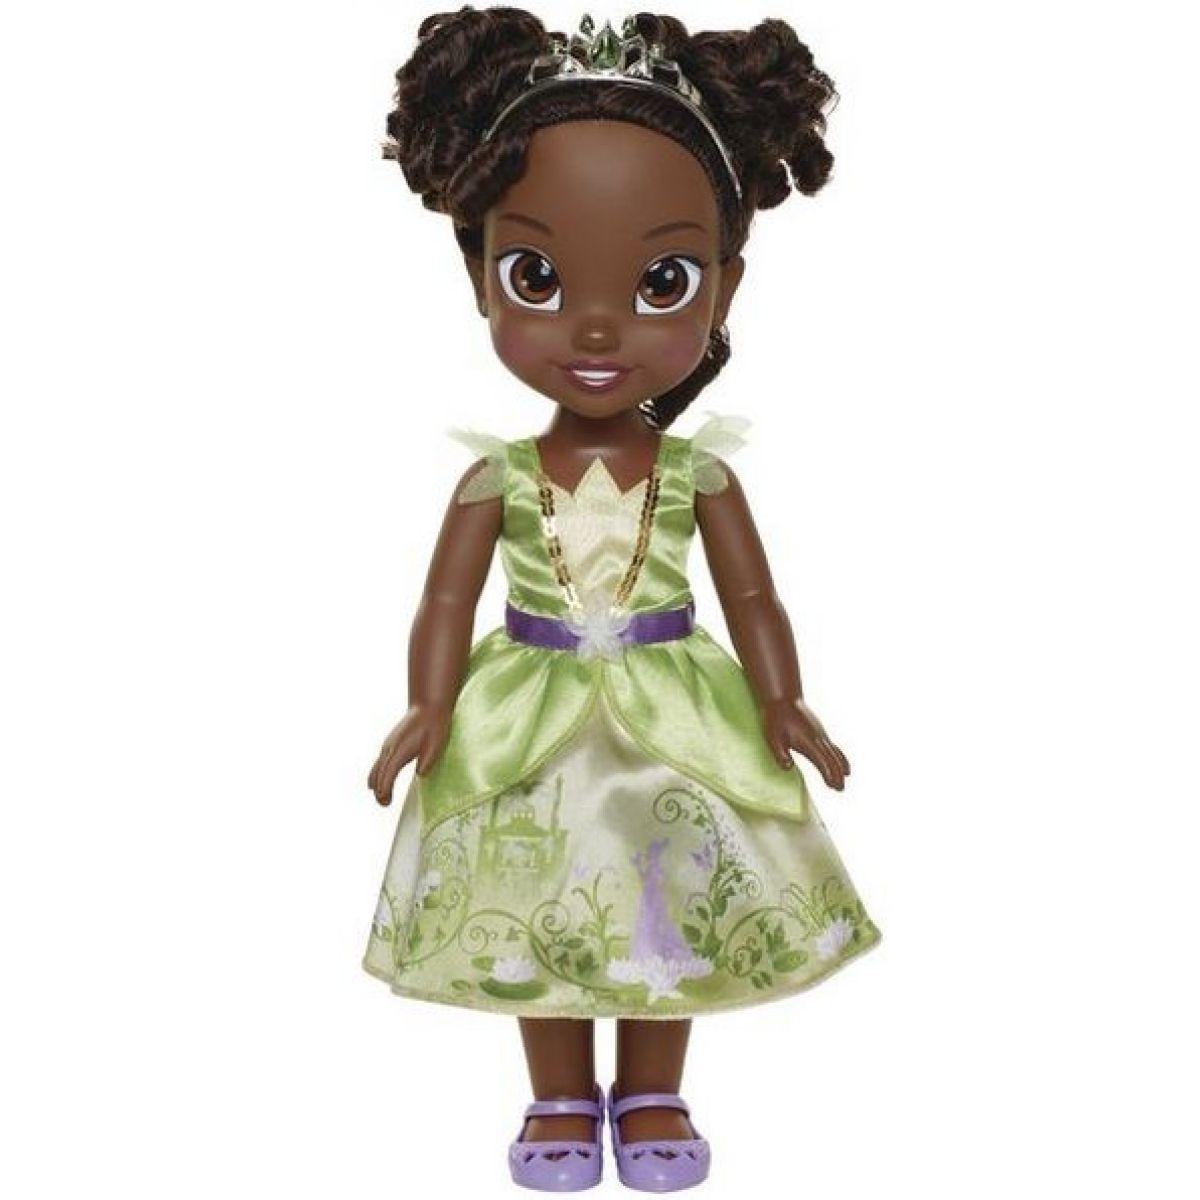 ADC Blackfire Disney Princess Tiana